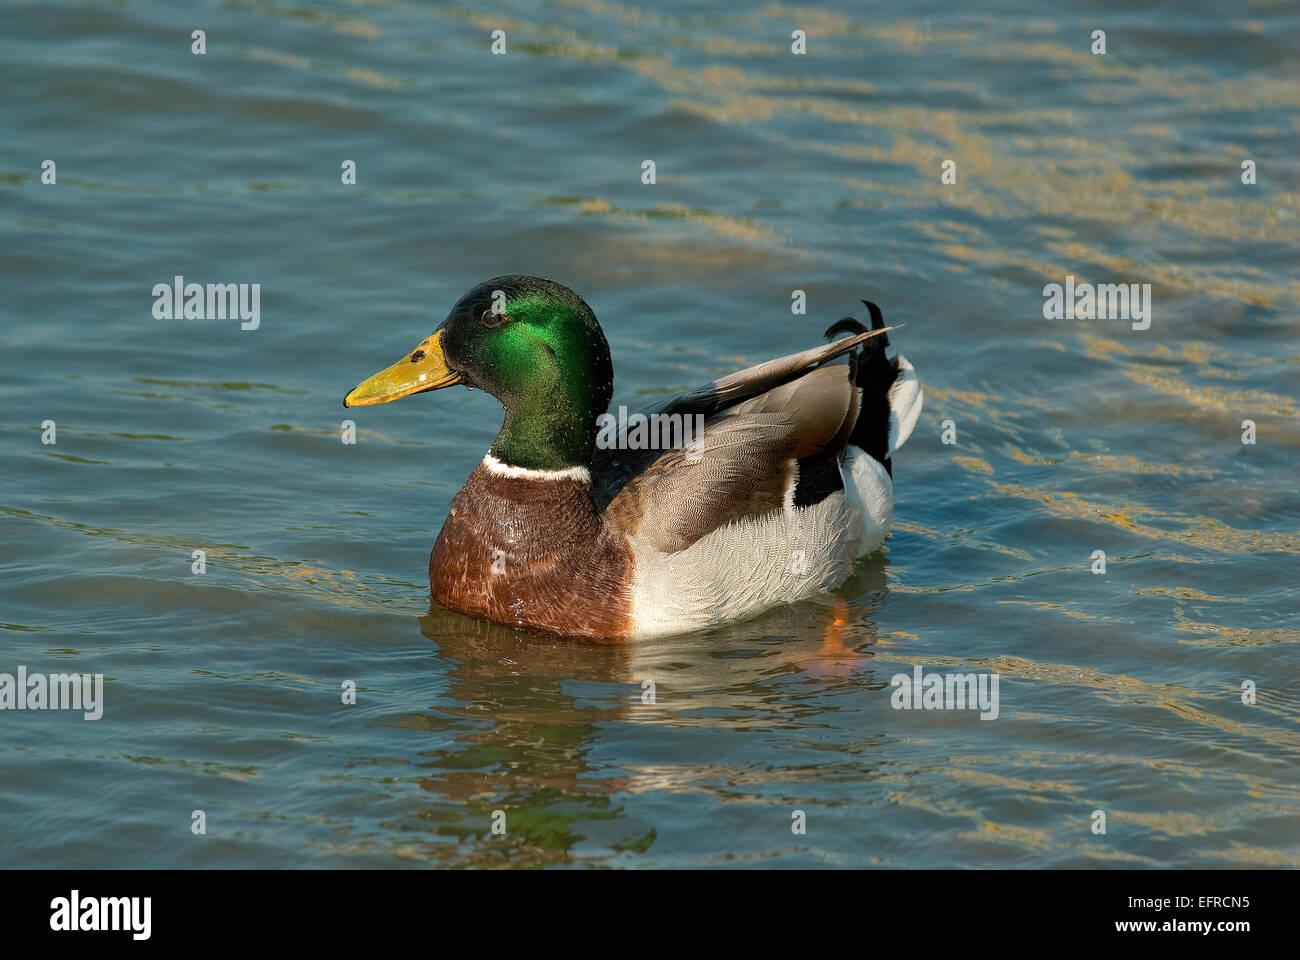 Mallard duck (Anas platyrhynchos), Lake Trasimeno, Umbria, Italy, Europe - Stock Image